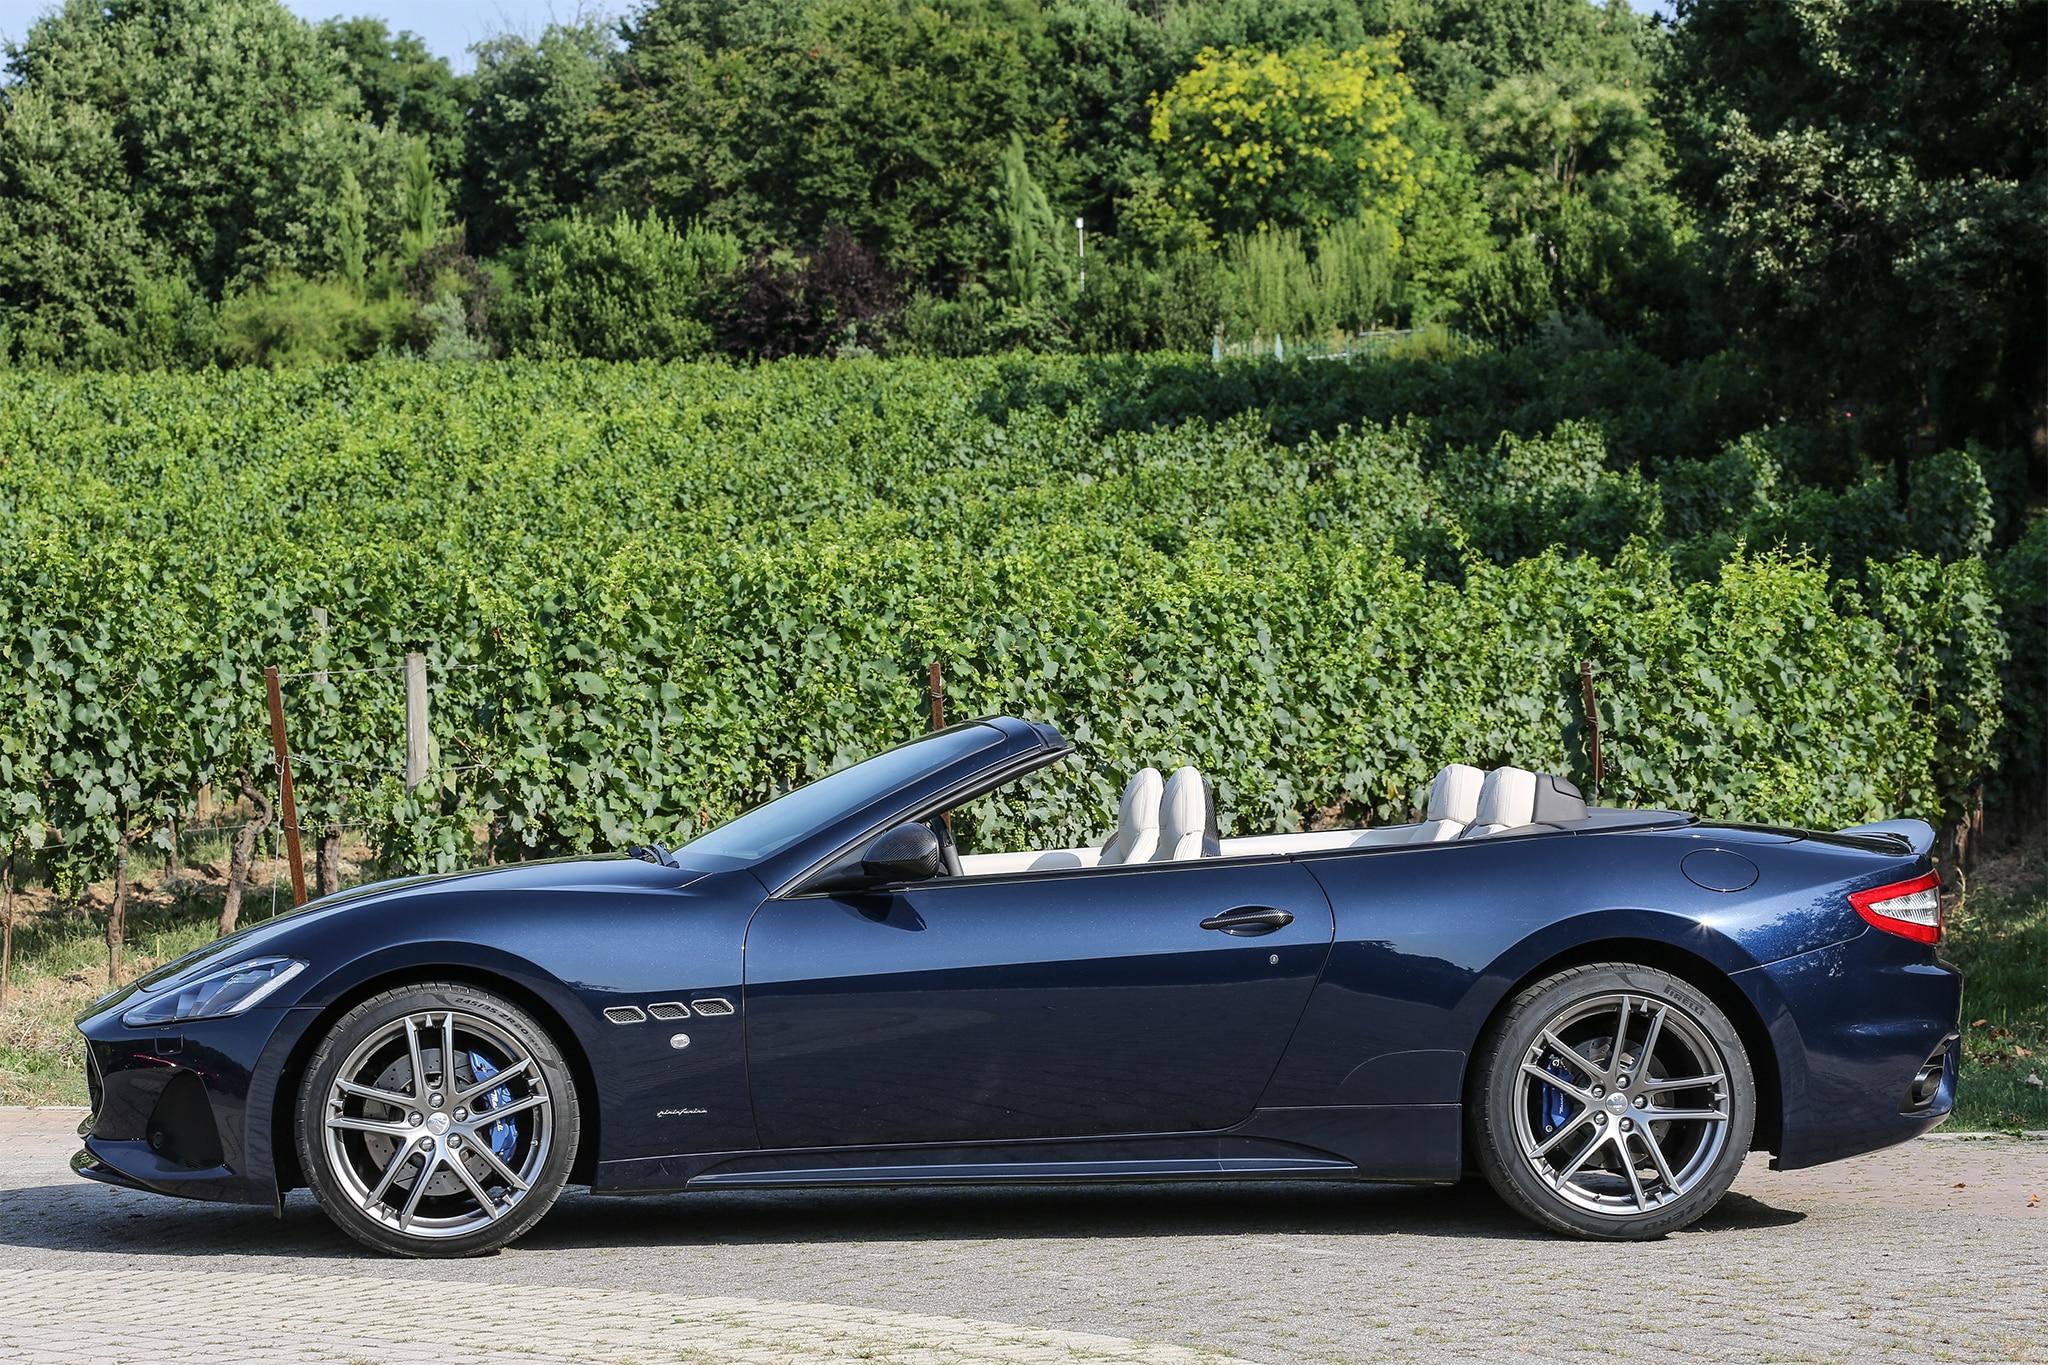 http://st.automobilemag.com/uploads/sites/11/2017/07/2018-Maserati-GranCabrio-Sport-side-profile-01.jpg